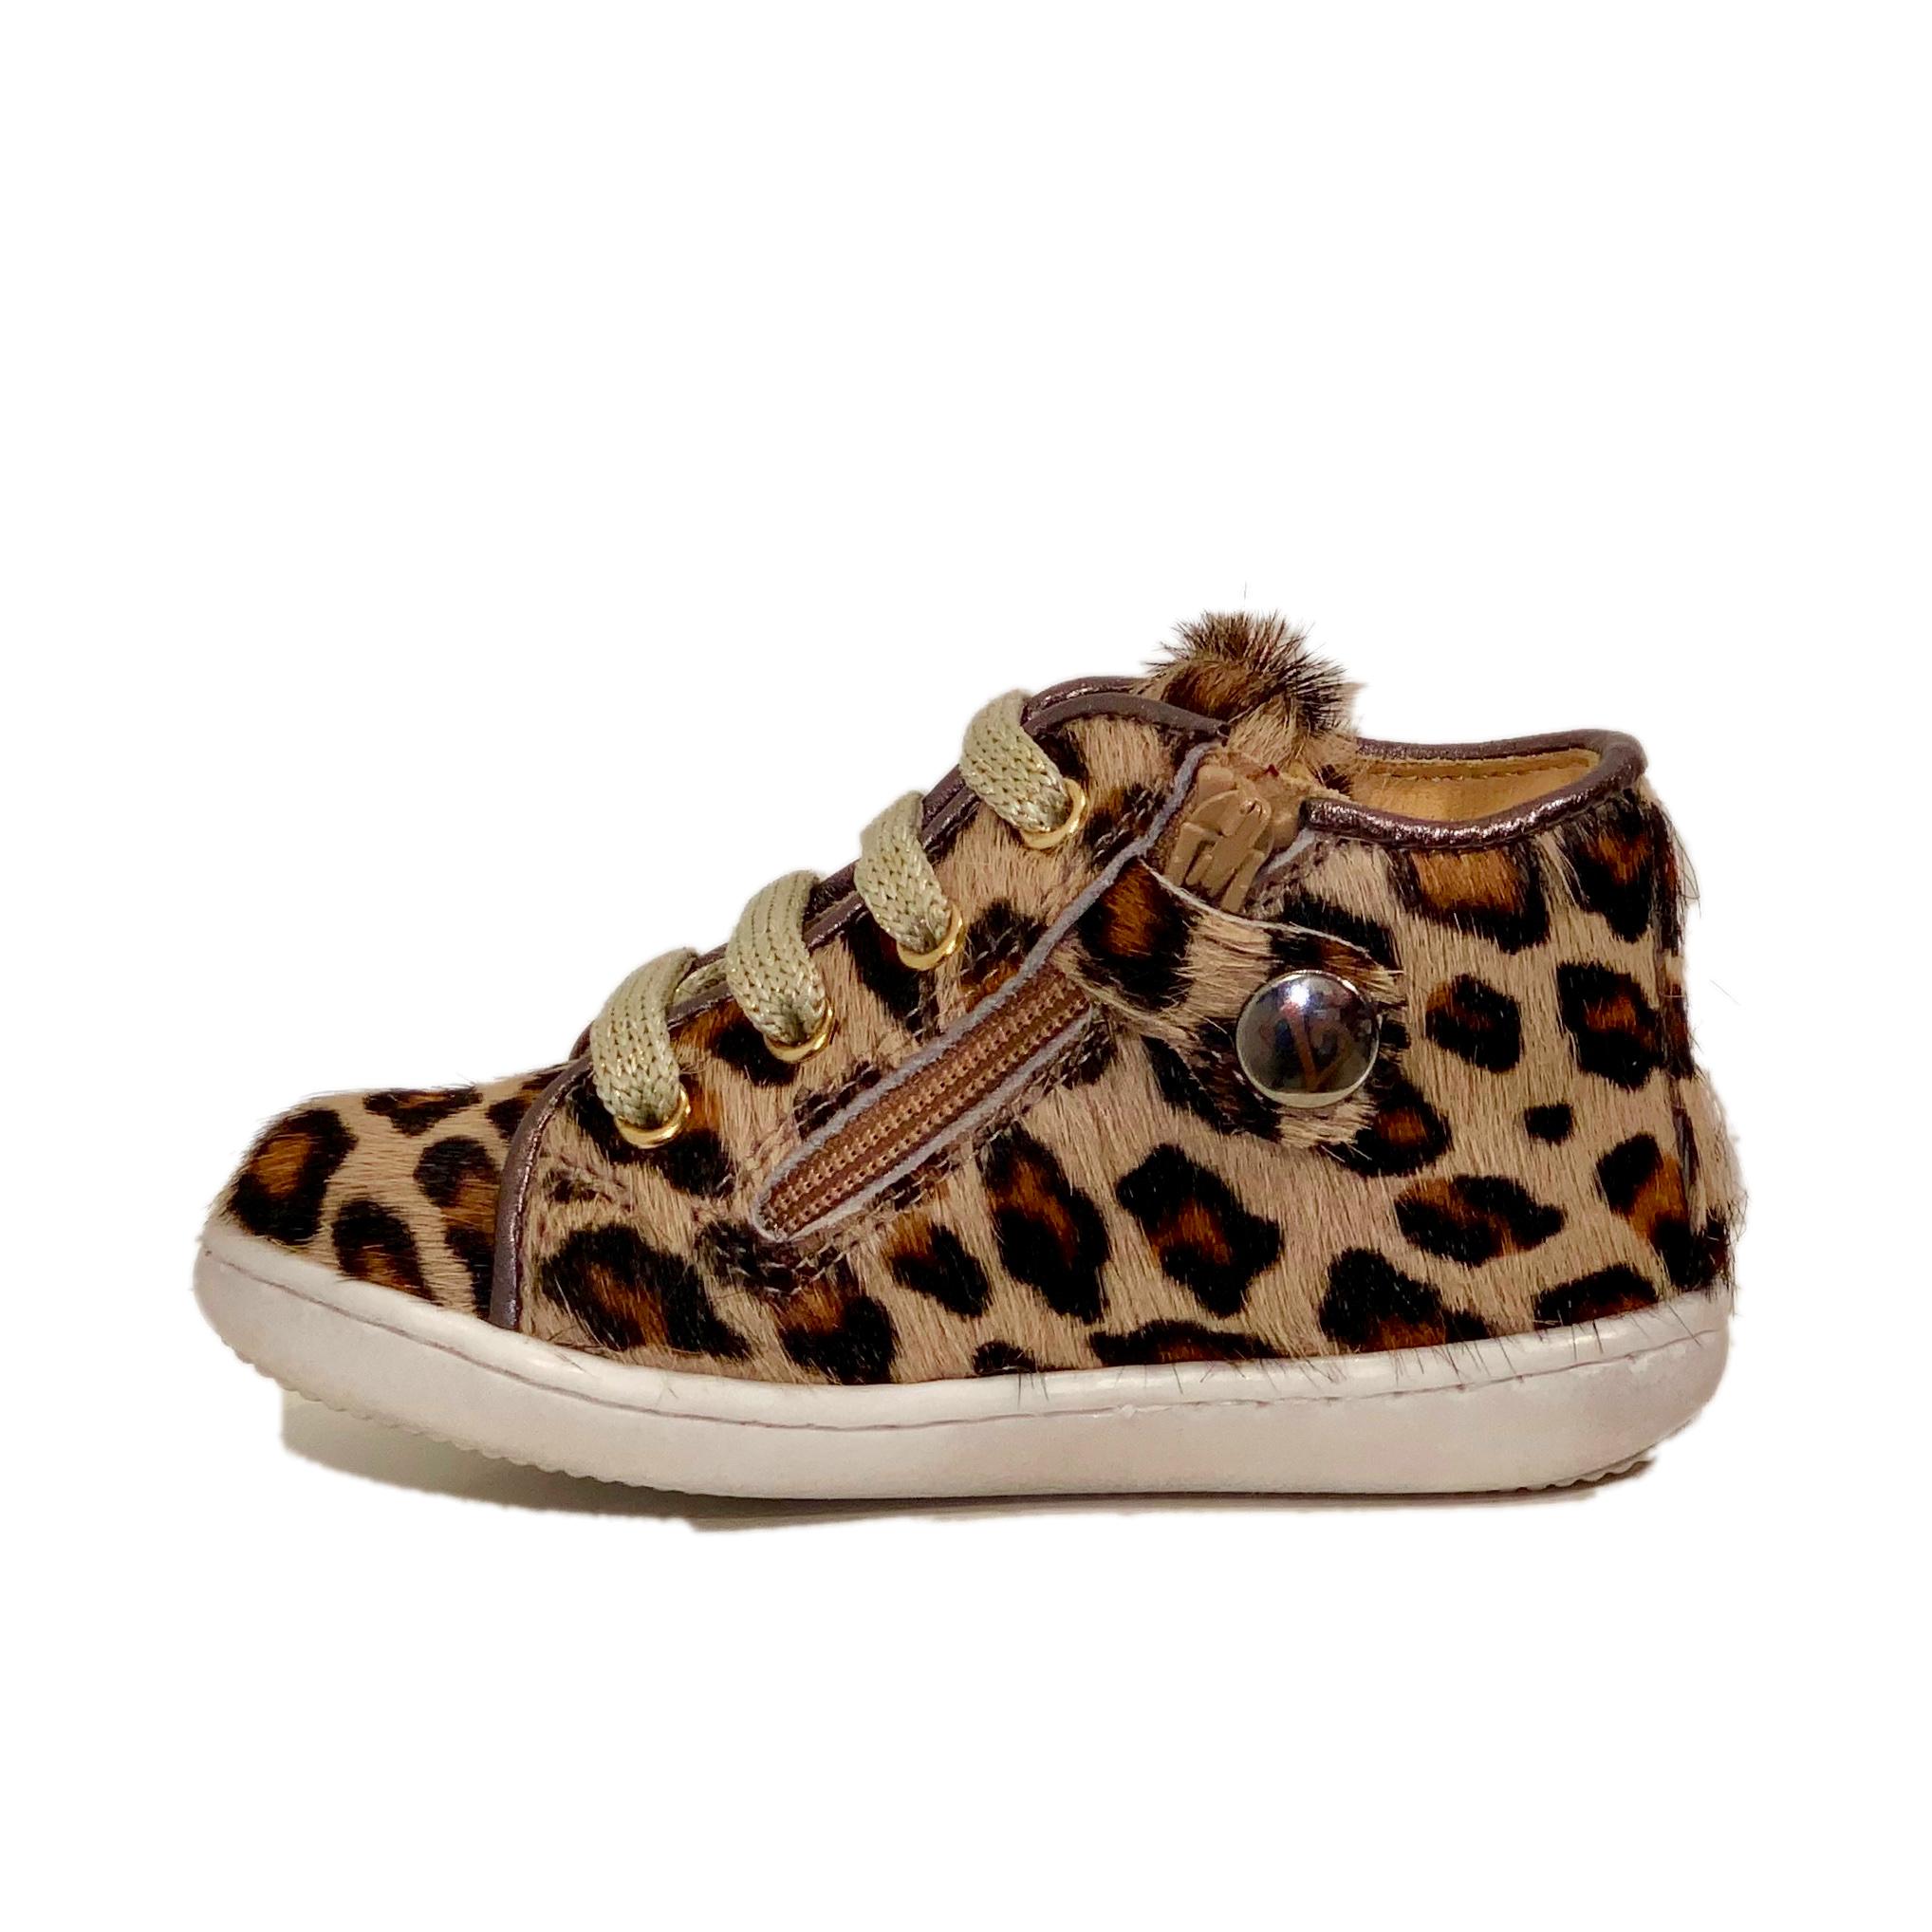 Zecchino d'oro N12-1357 leopard